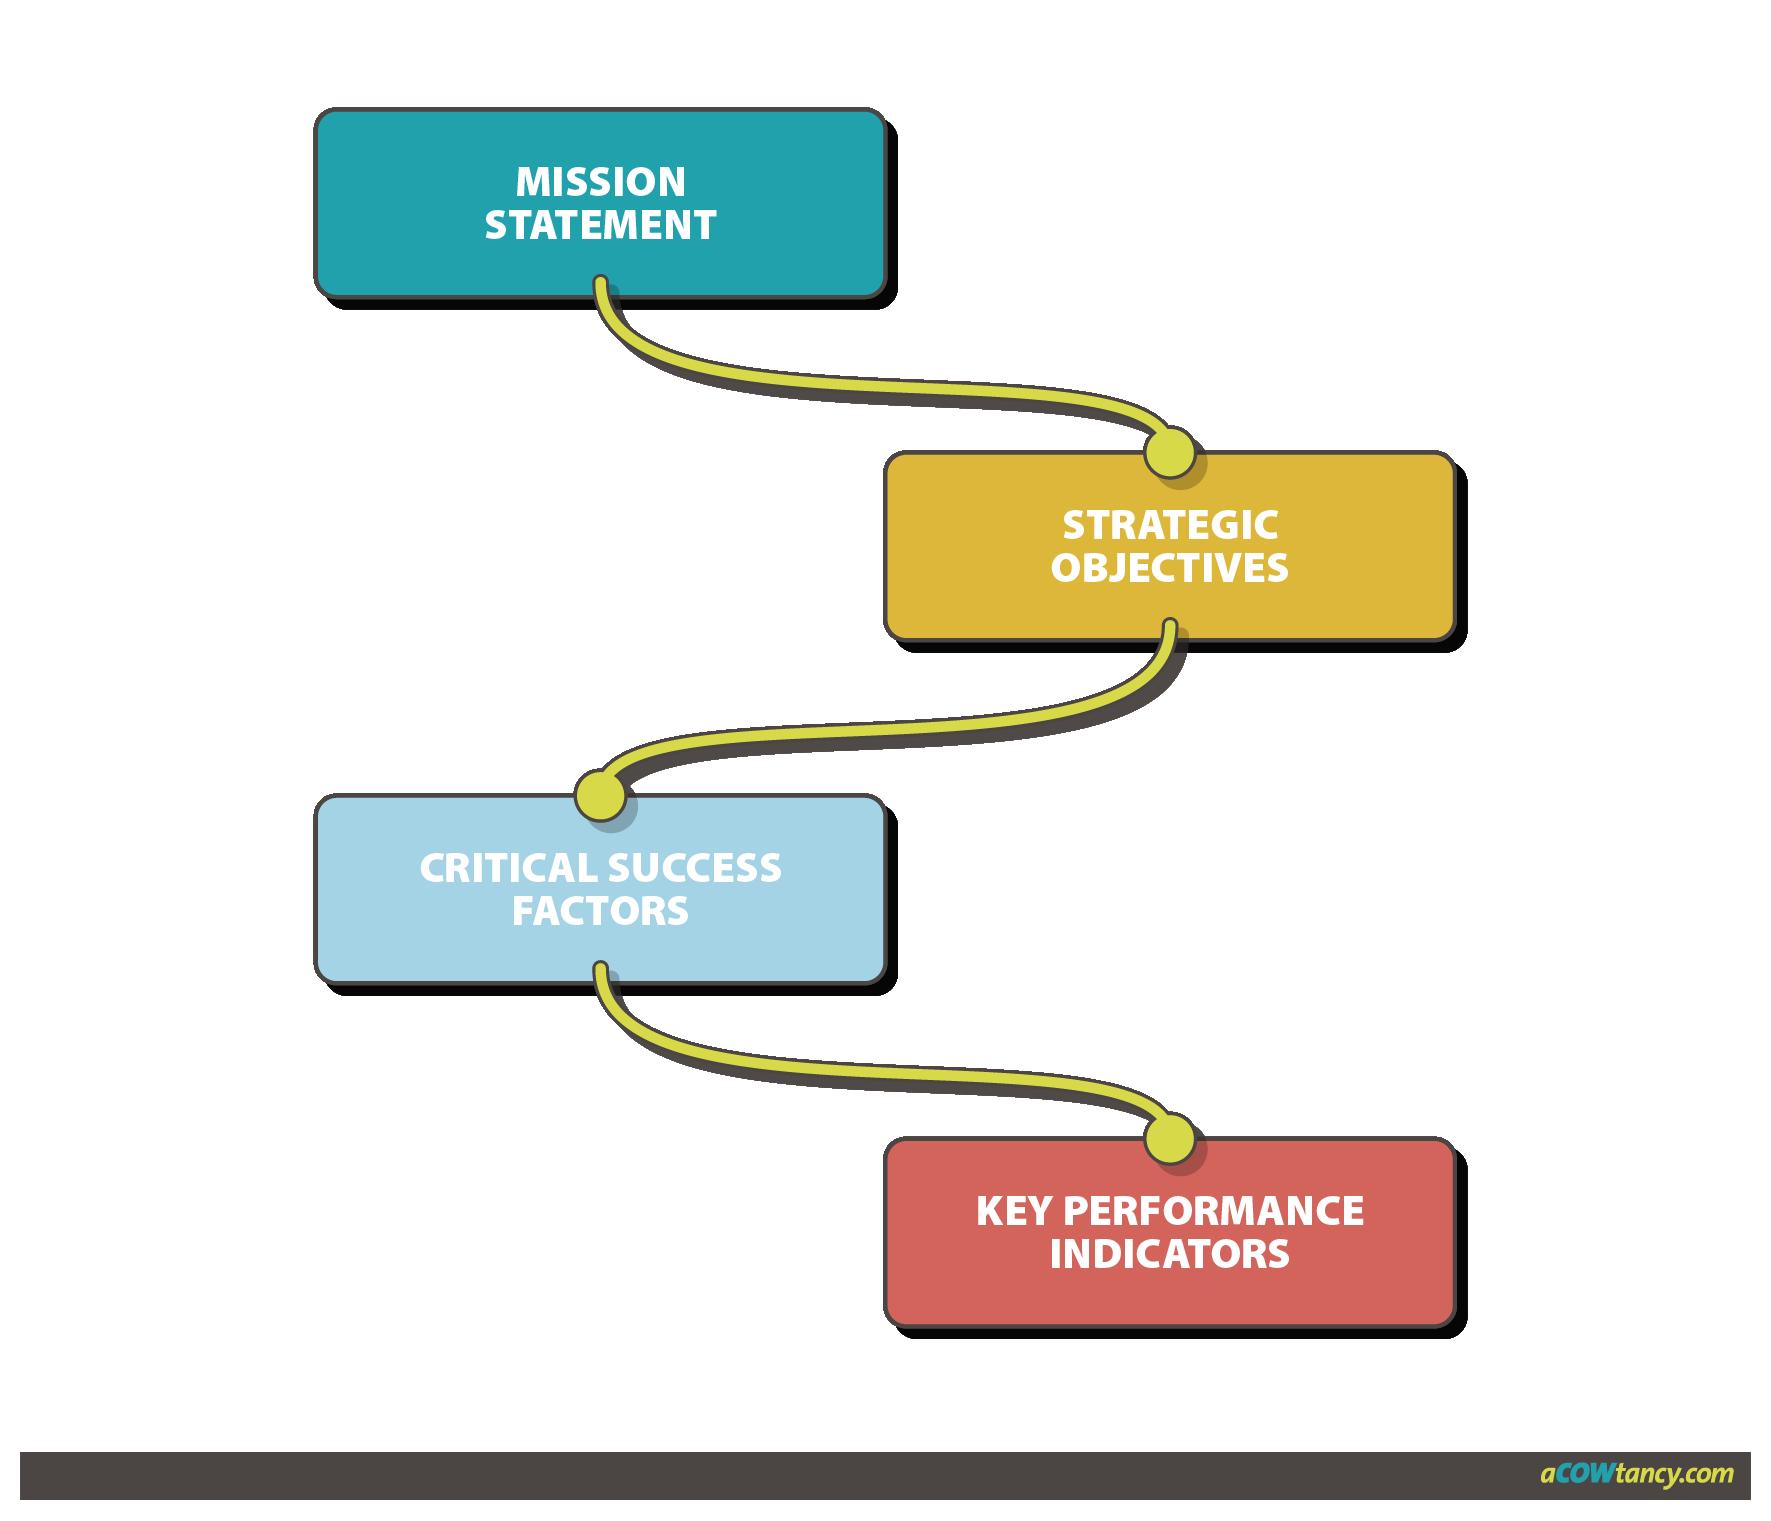 strategic performance measurement Strategic performance measurement - download as word doc (doc), pdf file (pdf), text file (txt) or read online from professor at uwa.